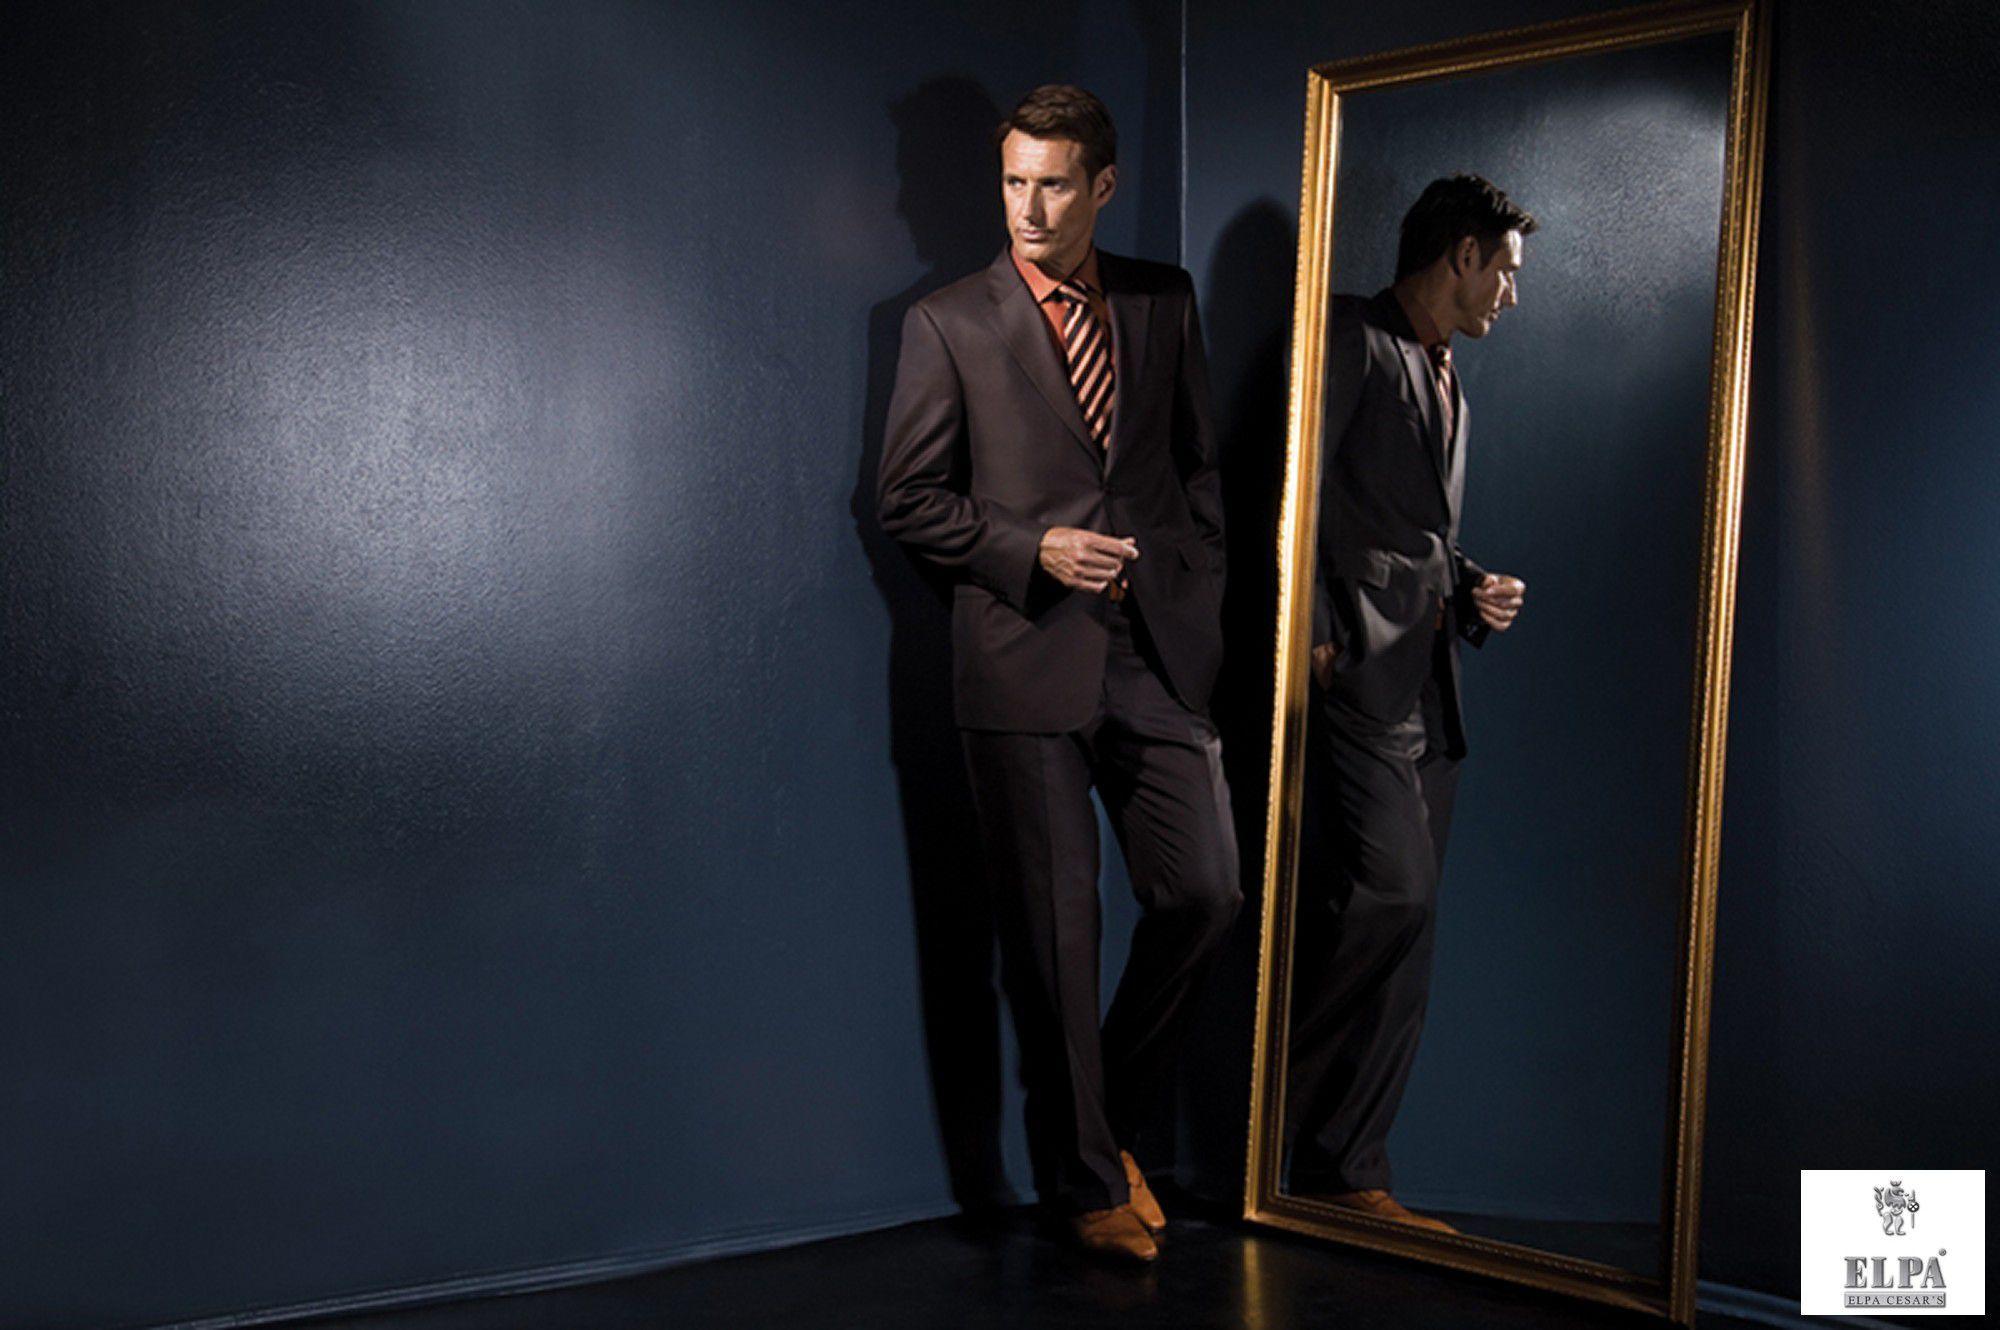 Collection Formal wear 2014 | ELPA MEN'S SUITS (Formal wear in Bahcelievler) - TurkishFashion.net